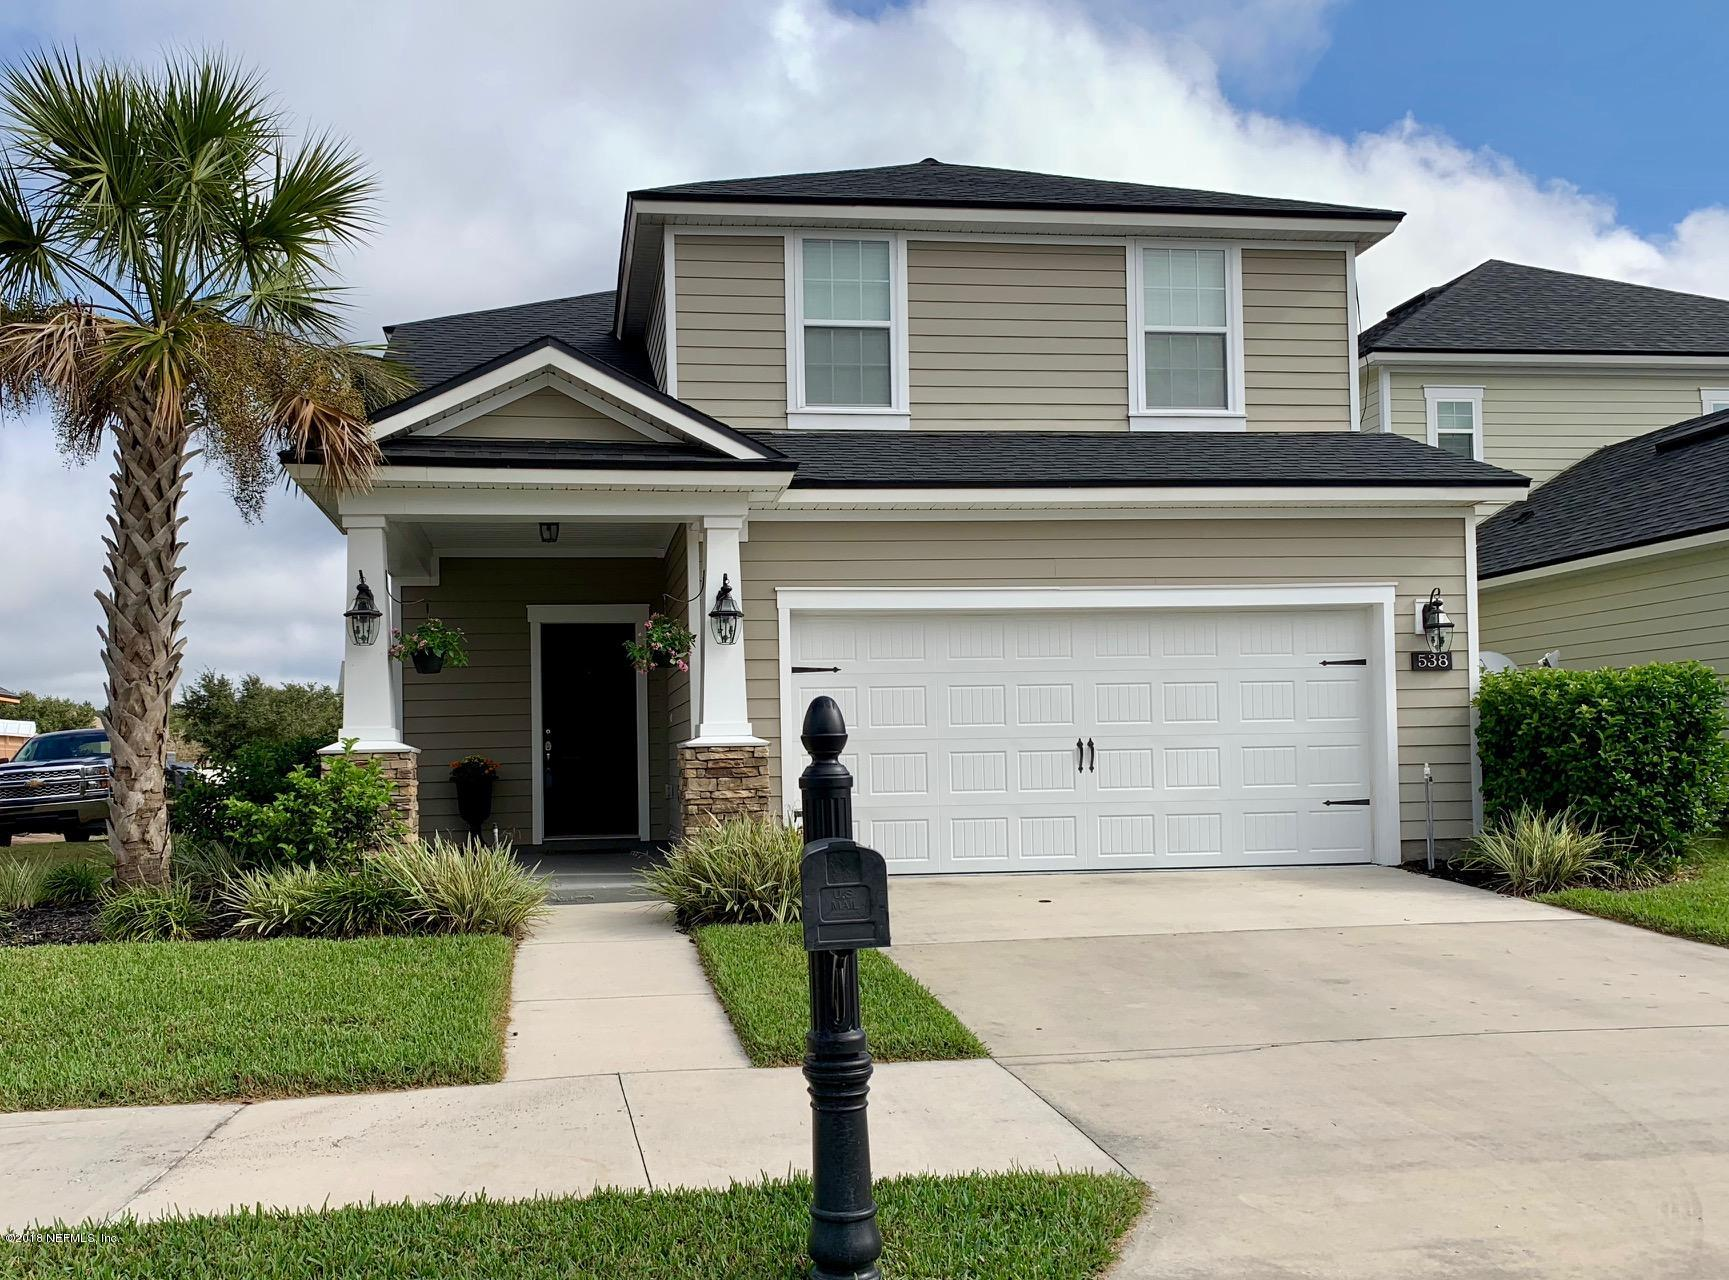 538 MELDRUM, ORANGE PARK, FLORIDA 32065, 3 Bedrooms Bedrooms, ,2 BathroomsBathrooms,Residential - single family,For sale,MELDRUM,966317